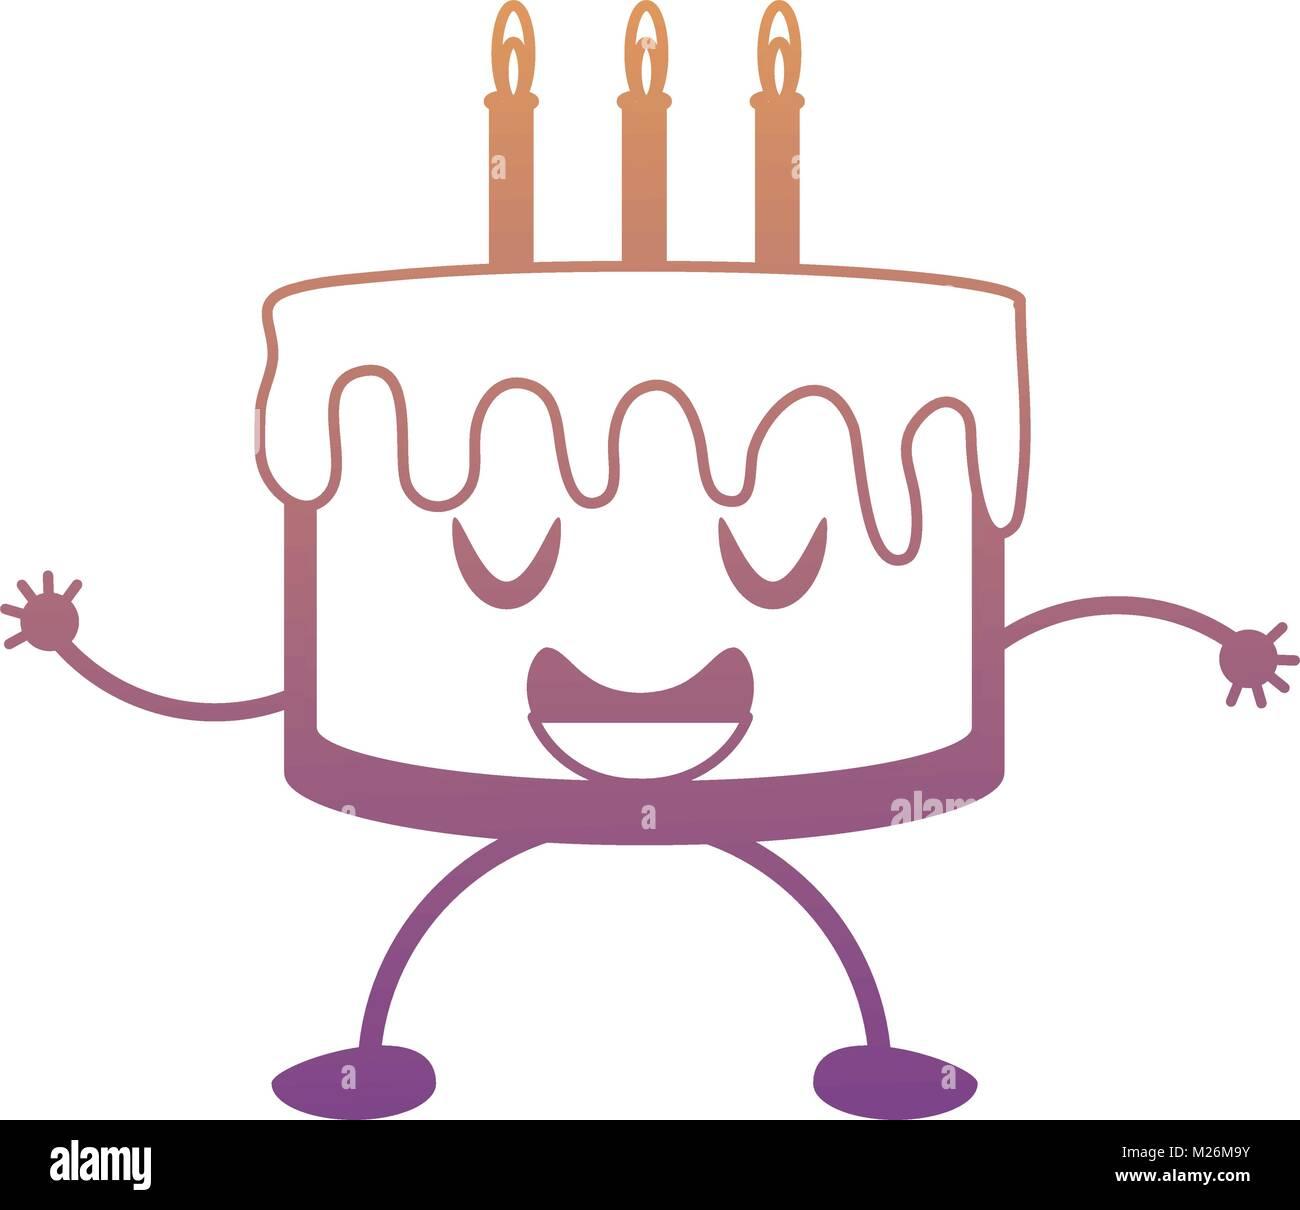 kawaii birthday cake icon Stock Vector Art Illustration Vector